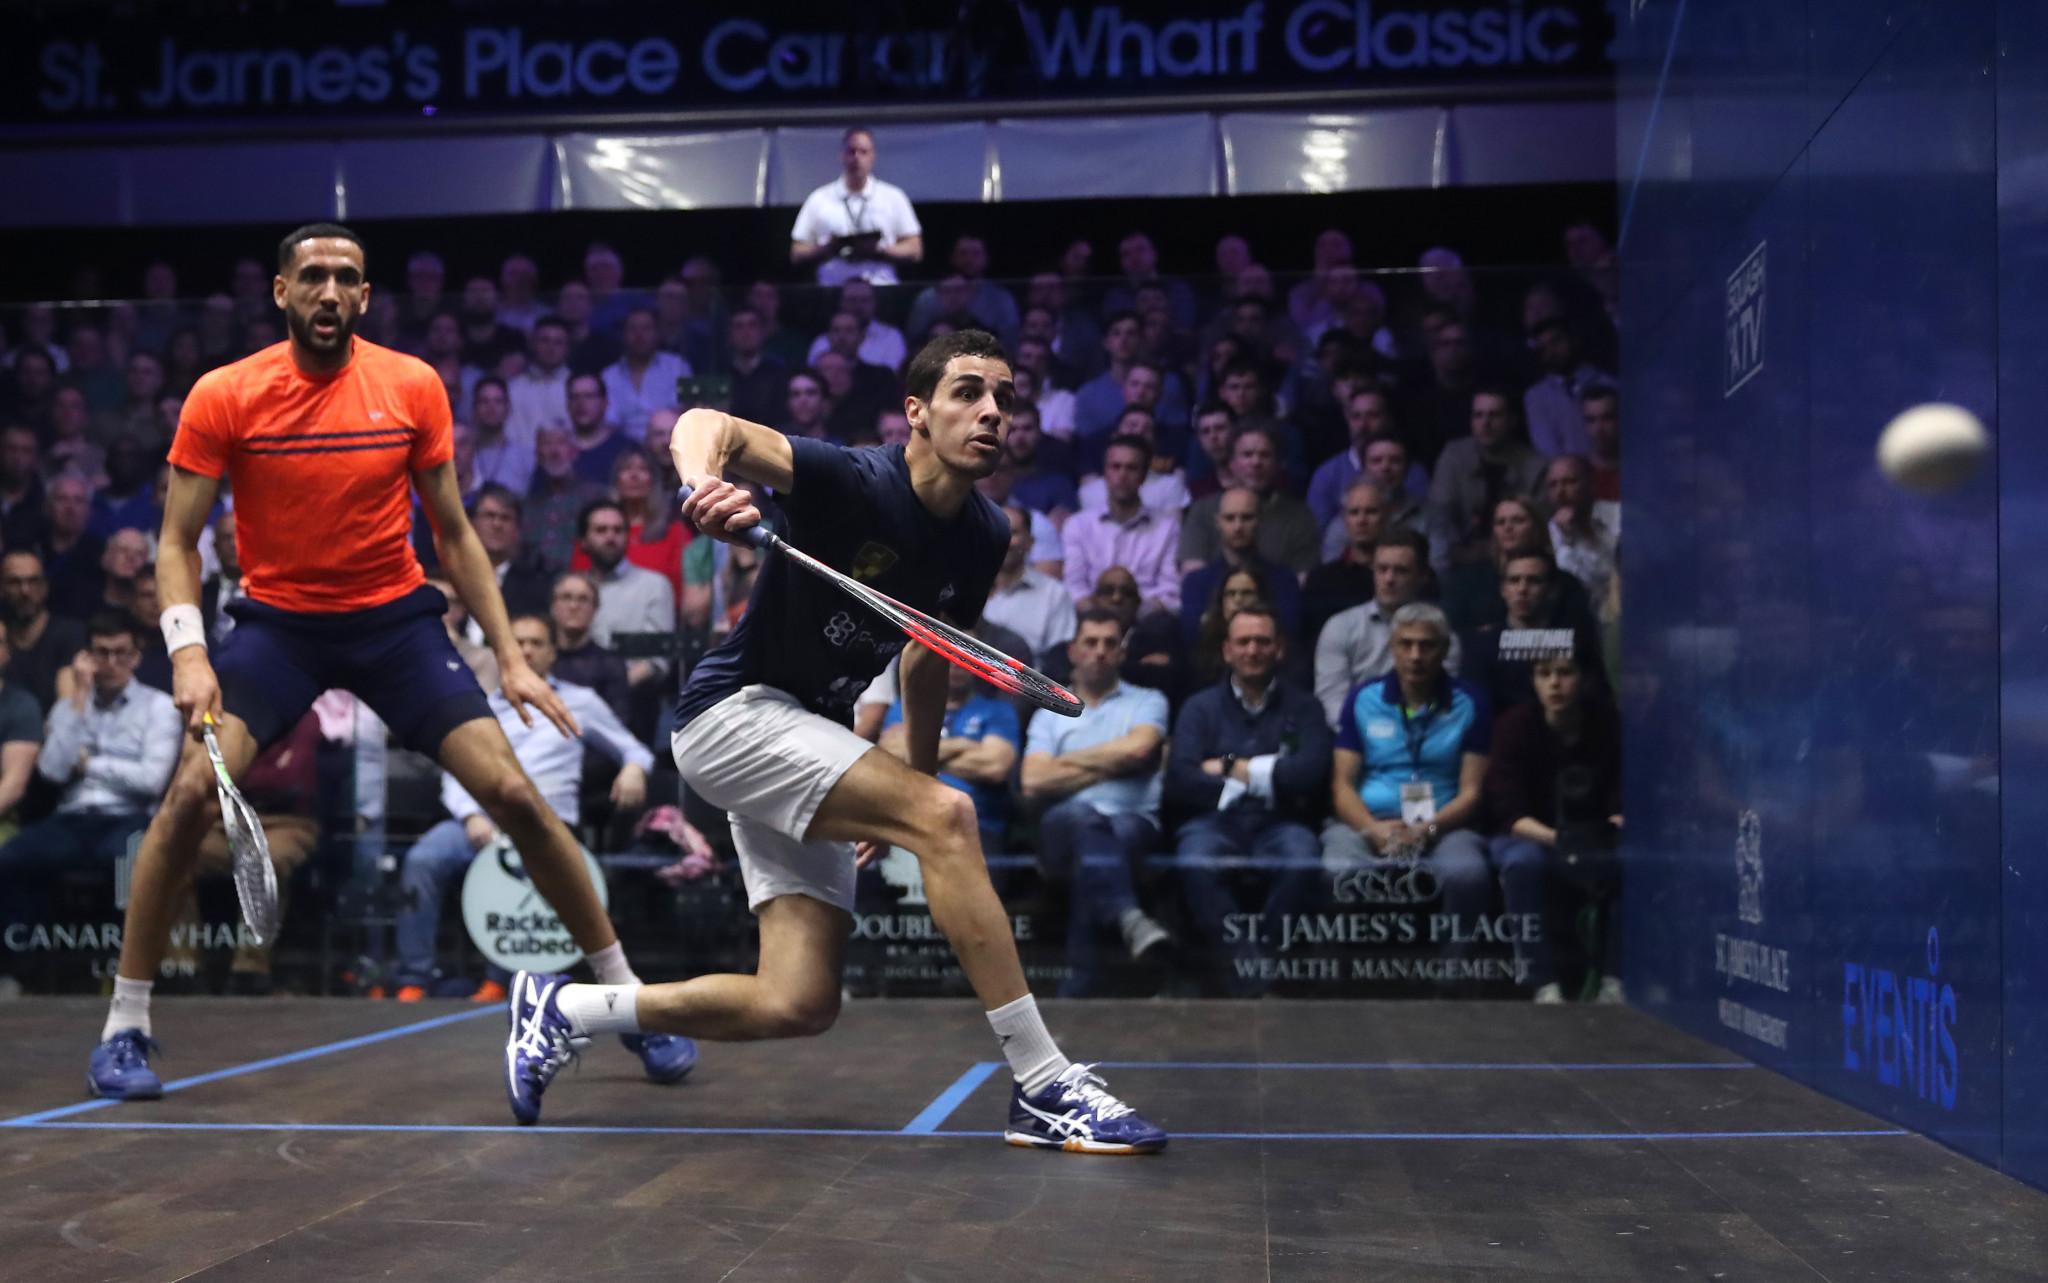 Farag and El Sherbini lead way as top 20 of PSA world rankings unchanged